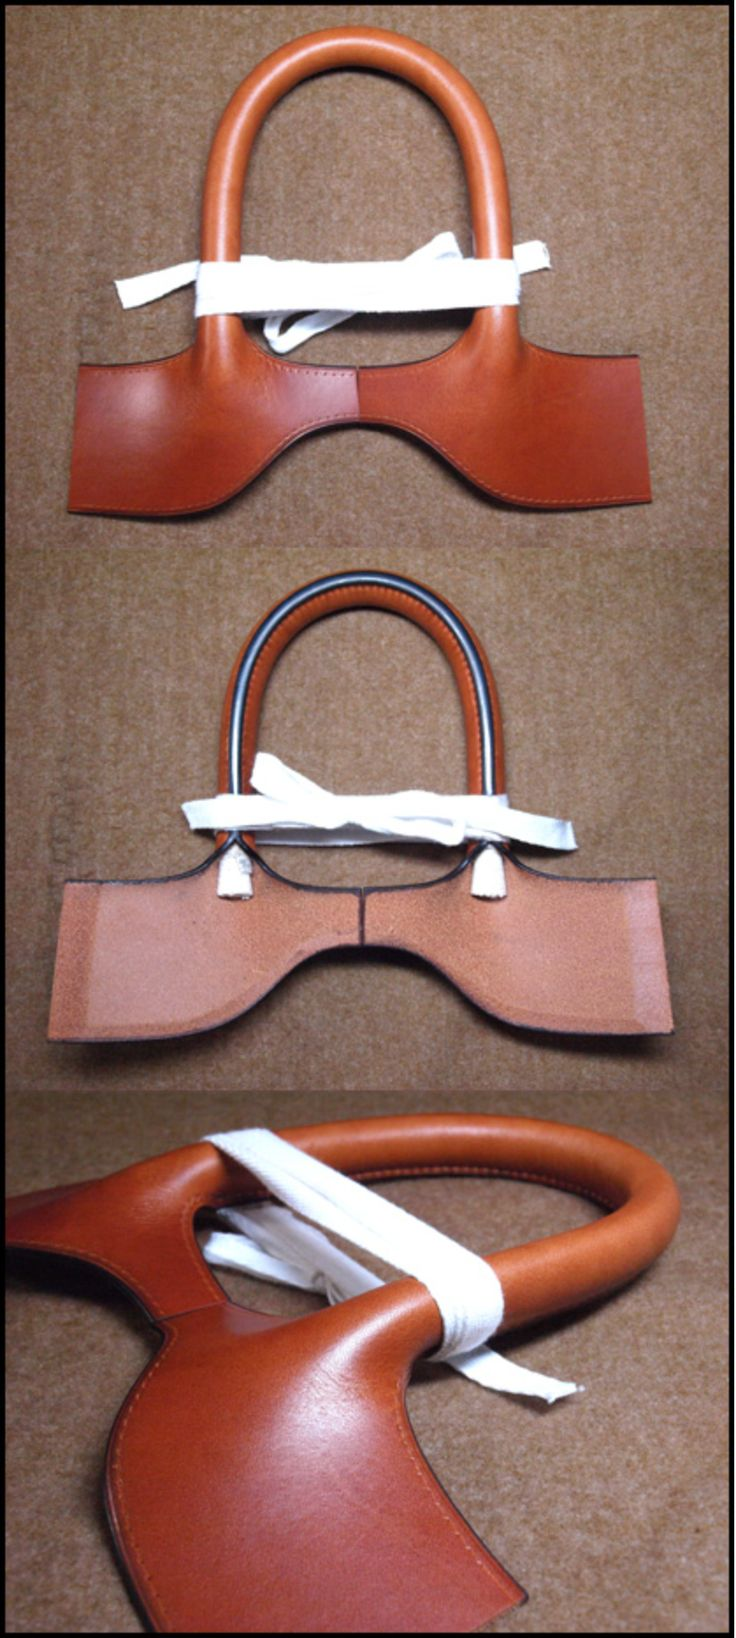 handle design